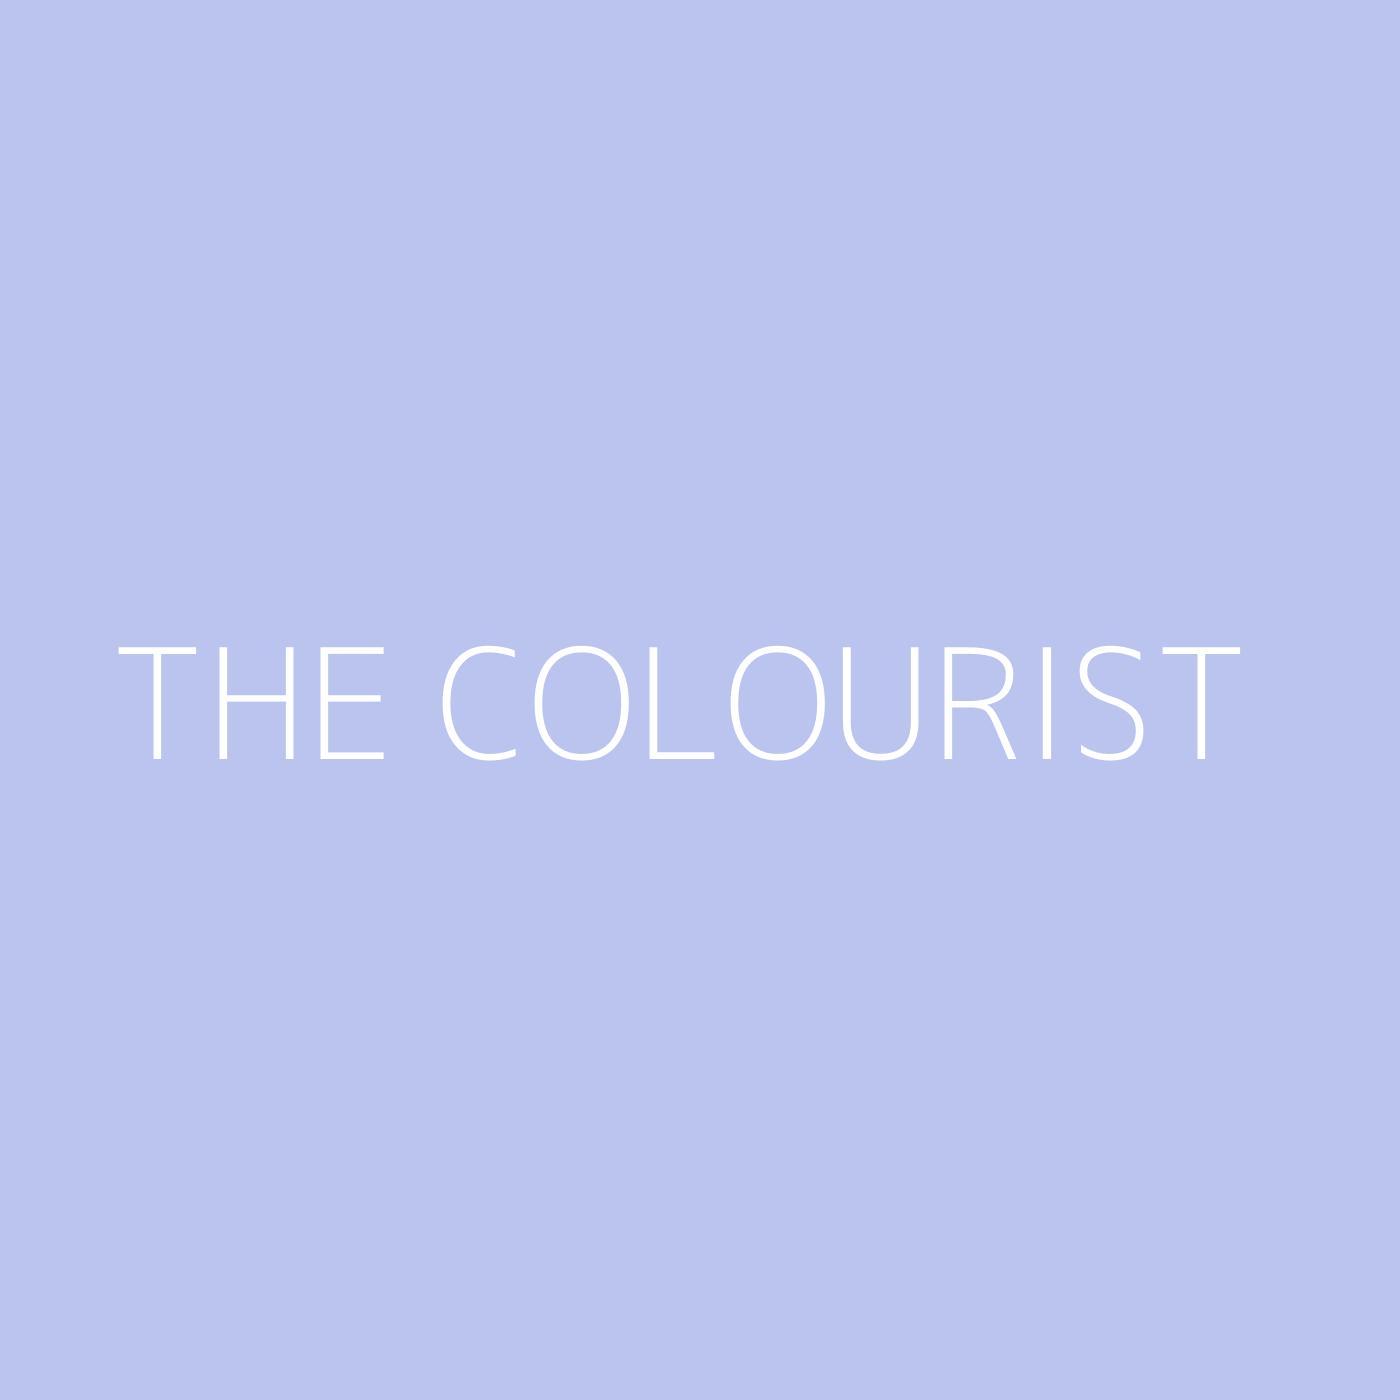 The Colourist Playlist Artwork